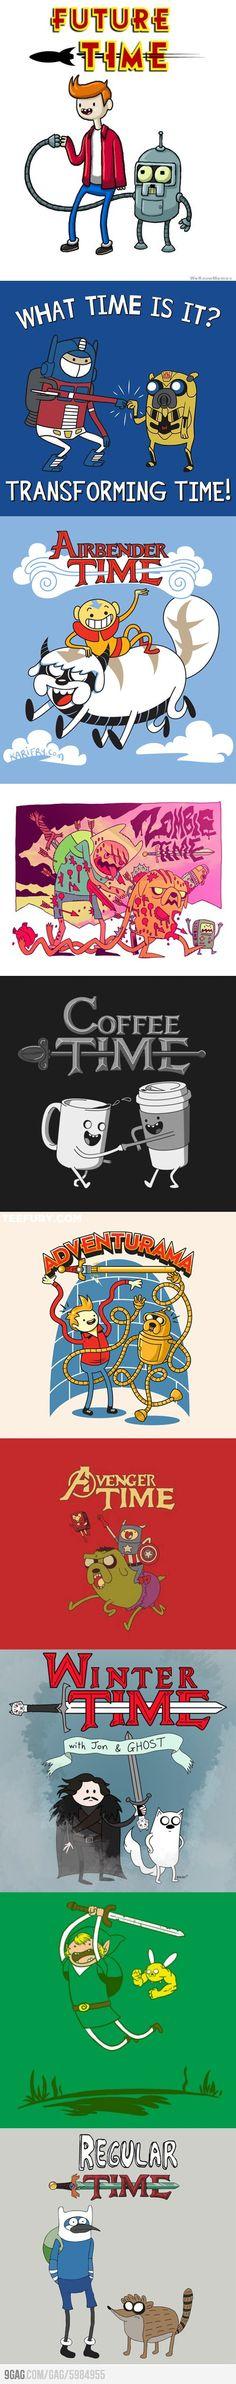 Adventure Time (mashups) - Jon Snow and Ghost :) @Emily Trombley